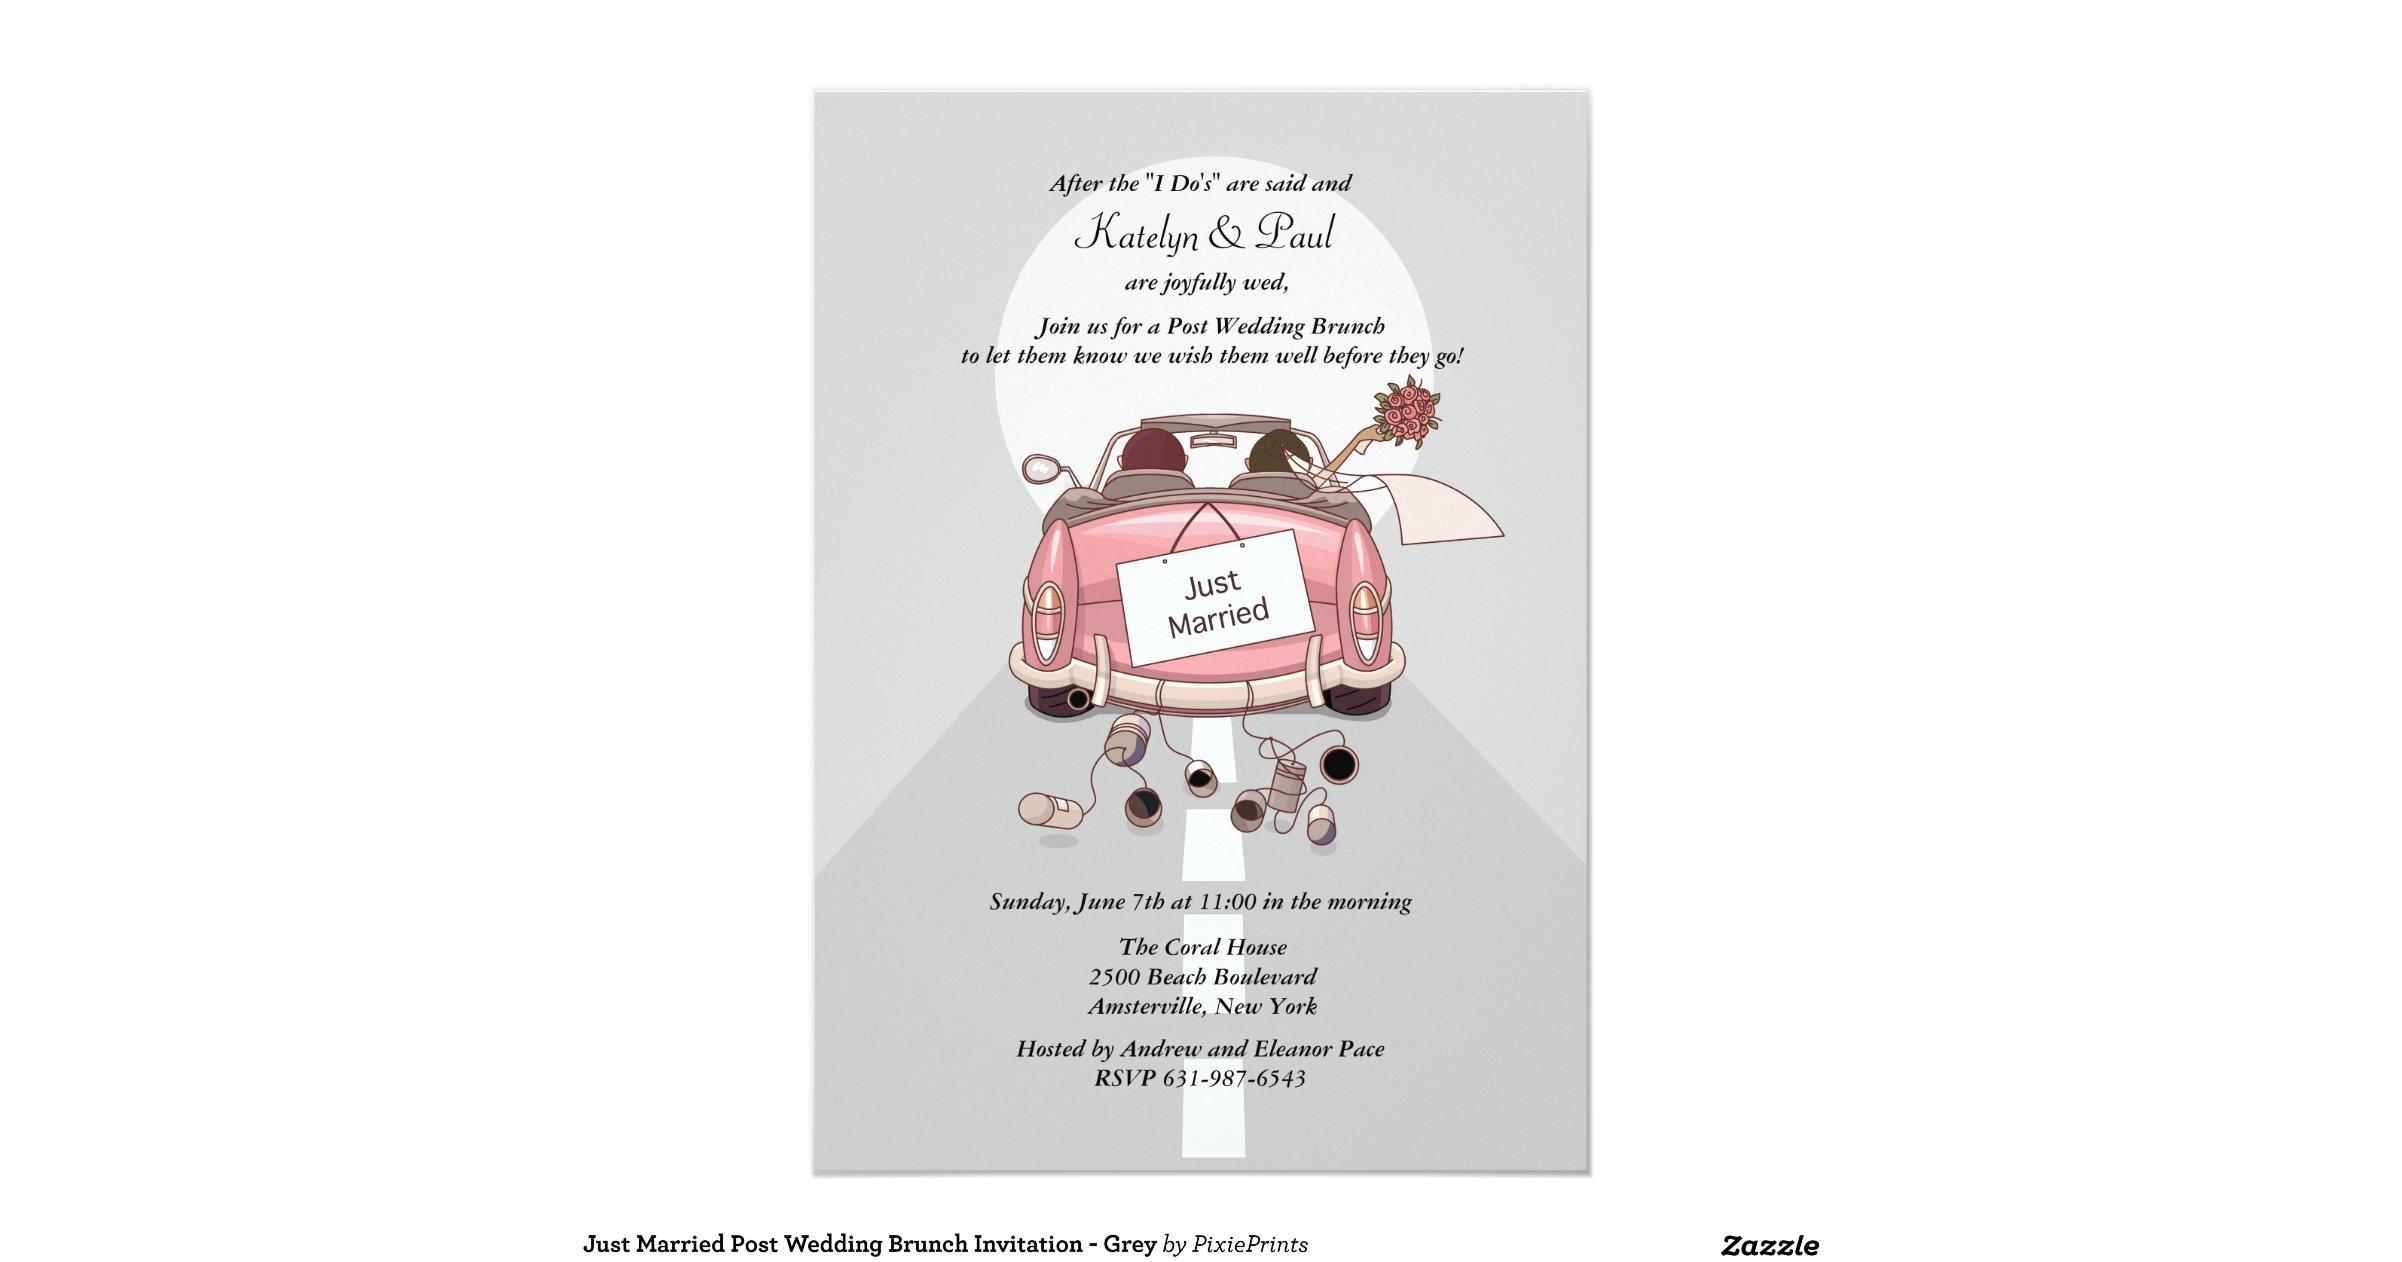 Post Wedding Brunch Invitation Wording: Just_married_post_wedding_brunch_invitation_grey